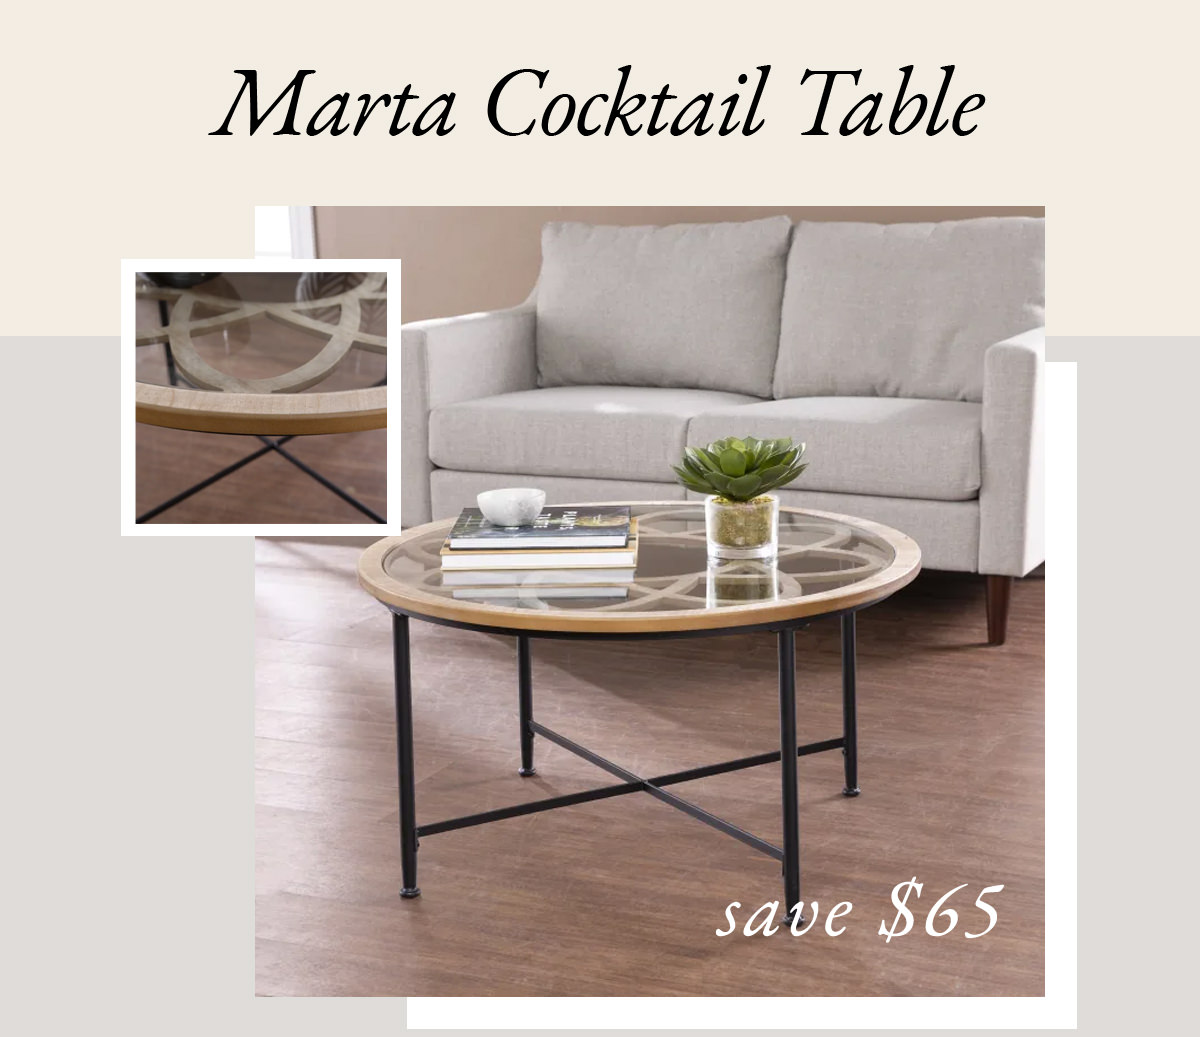 Marta Cocktail Table | SHOP NOW